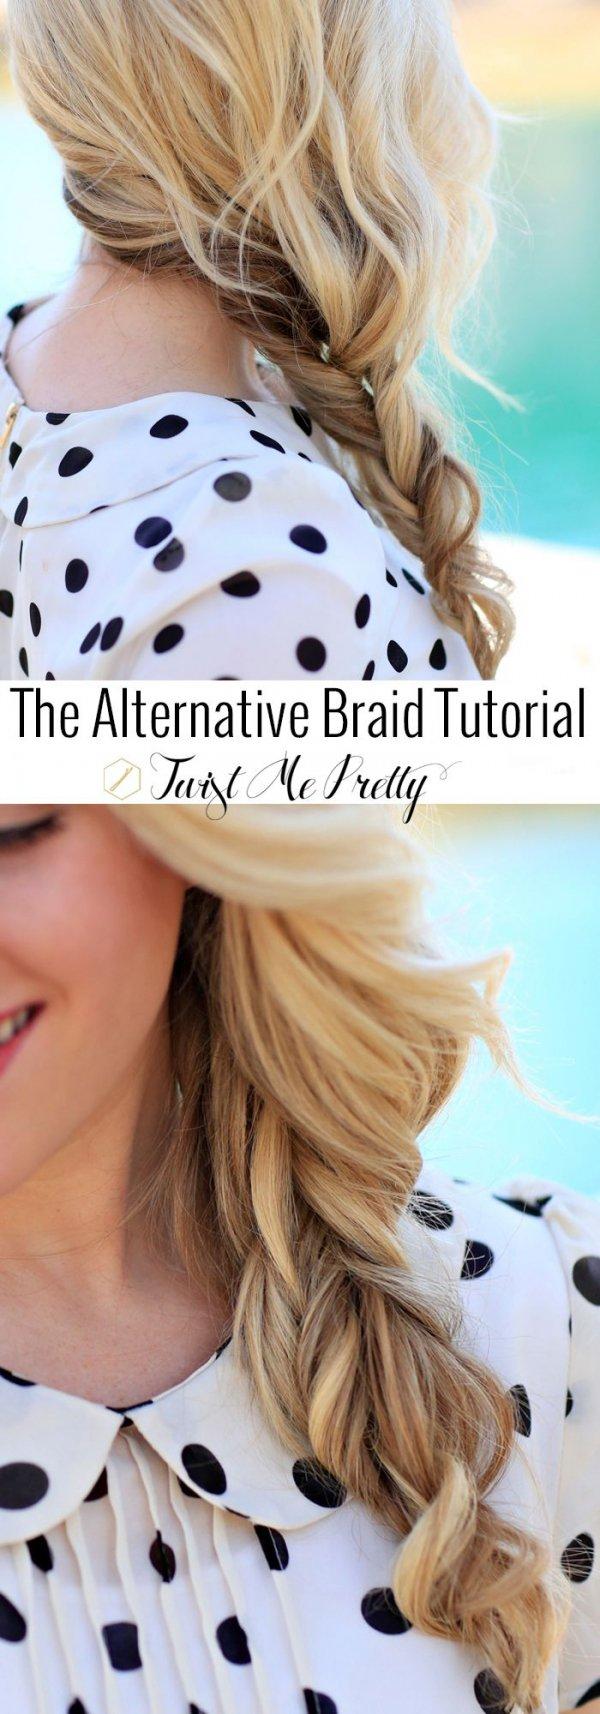 Alternative Braid Tutorial